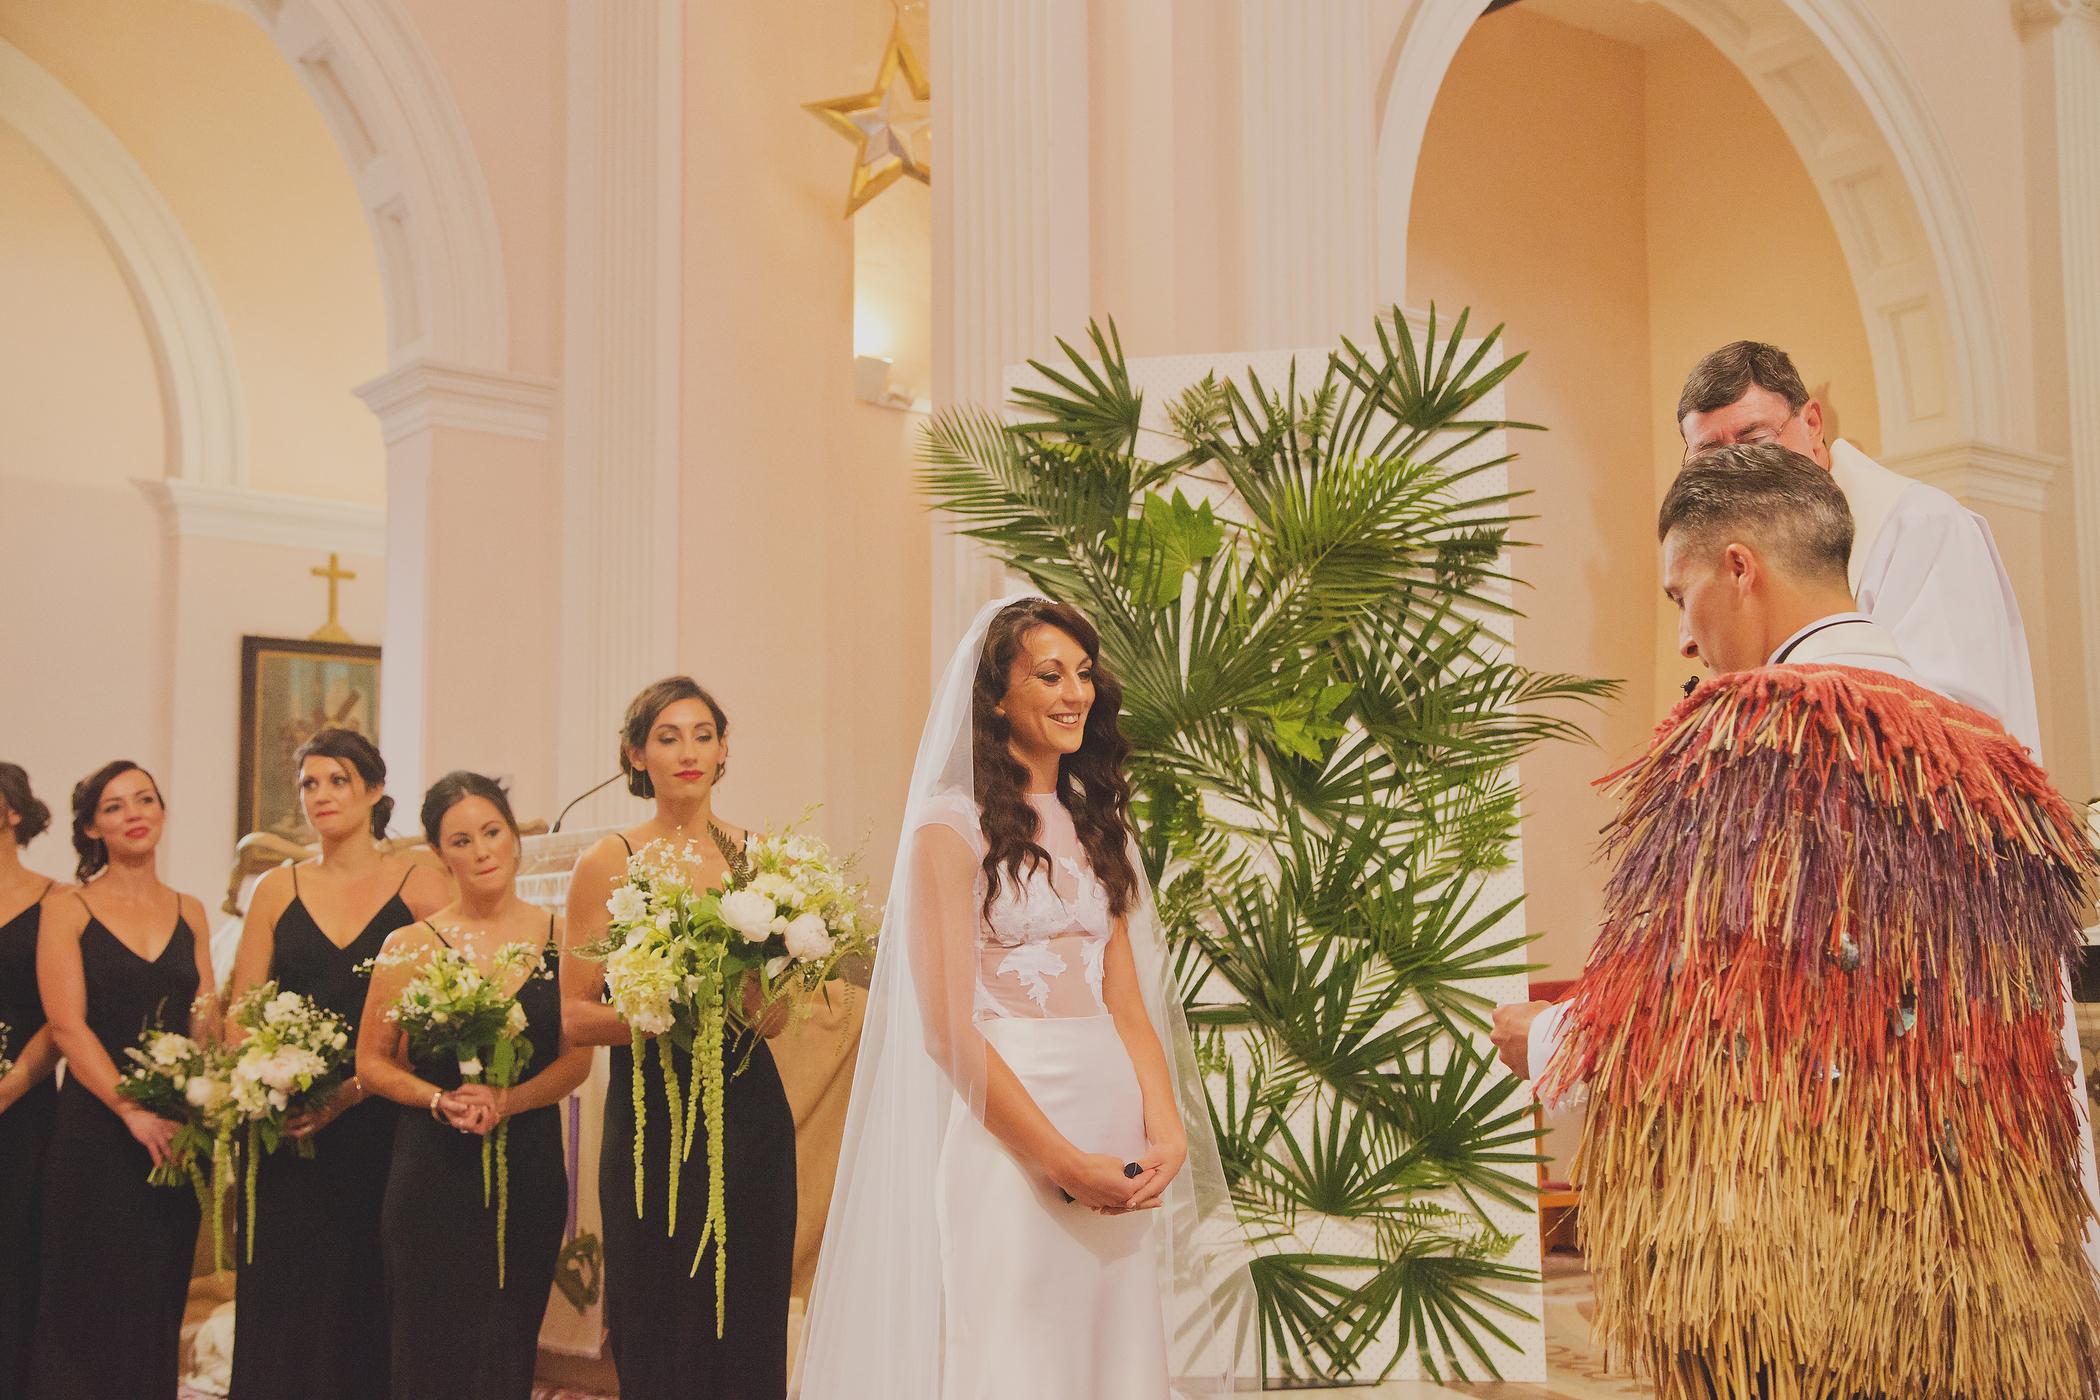 wellington wedding photography NZ - 1213.JPG